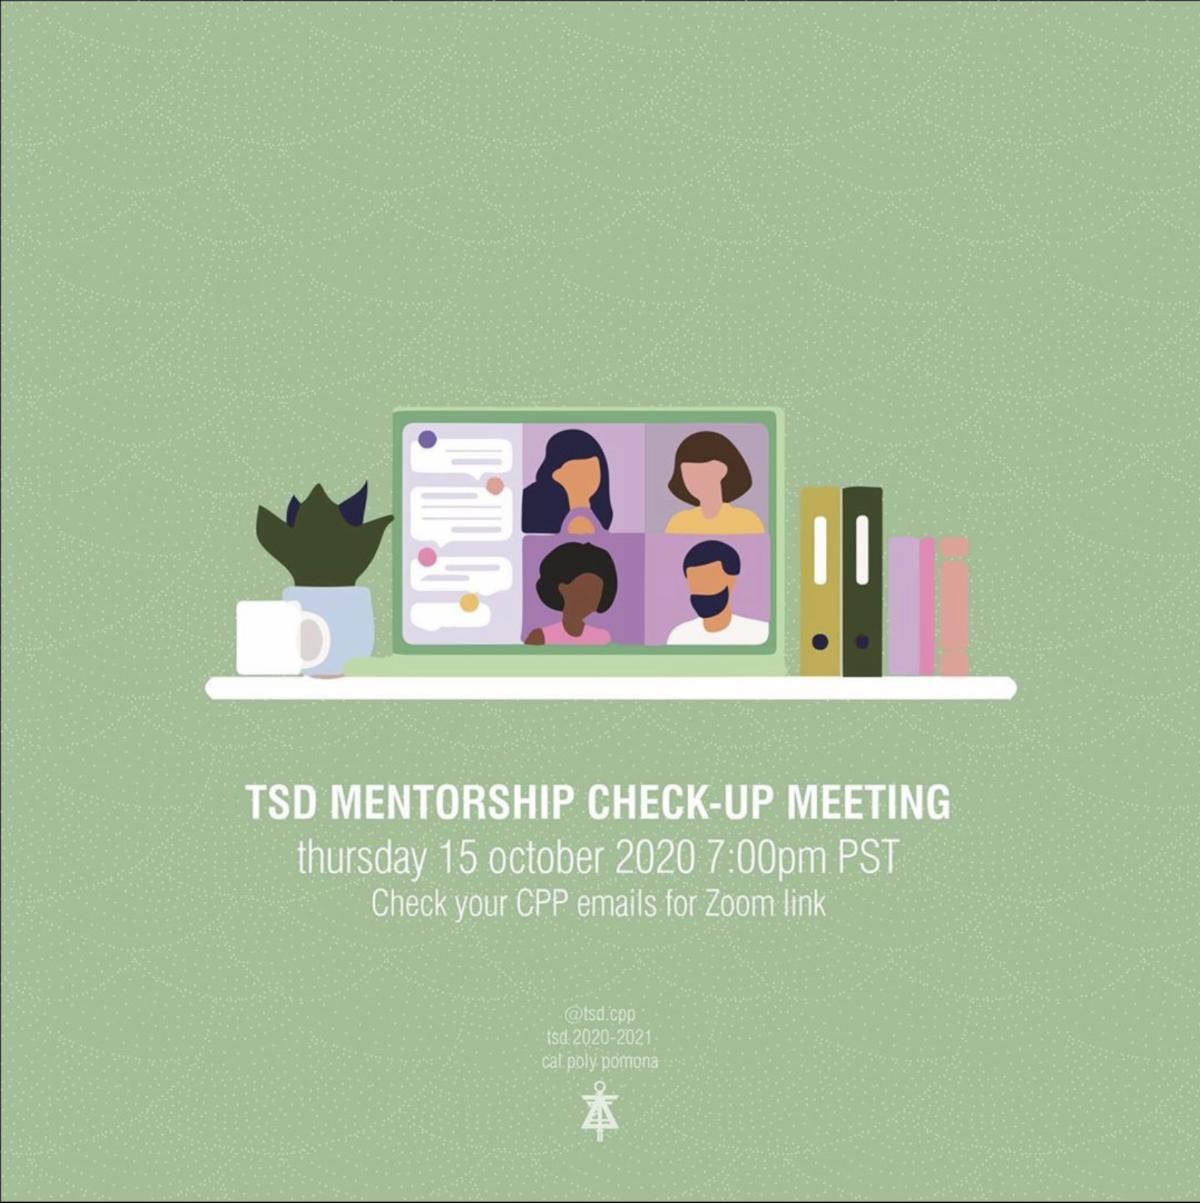 tsd mentor-mentee program meeting